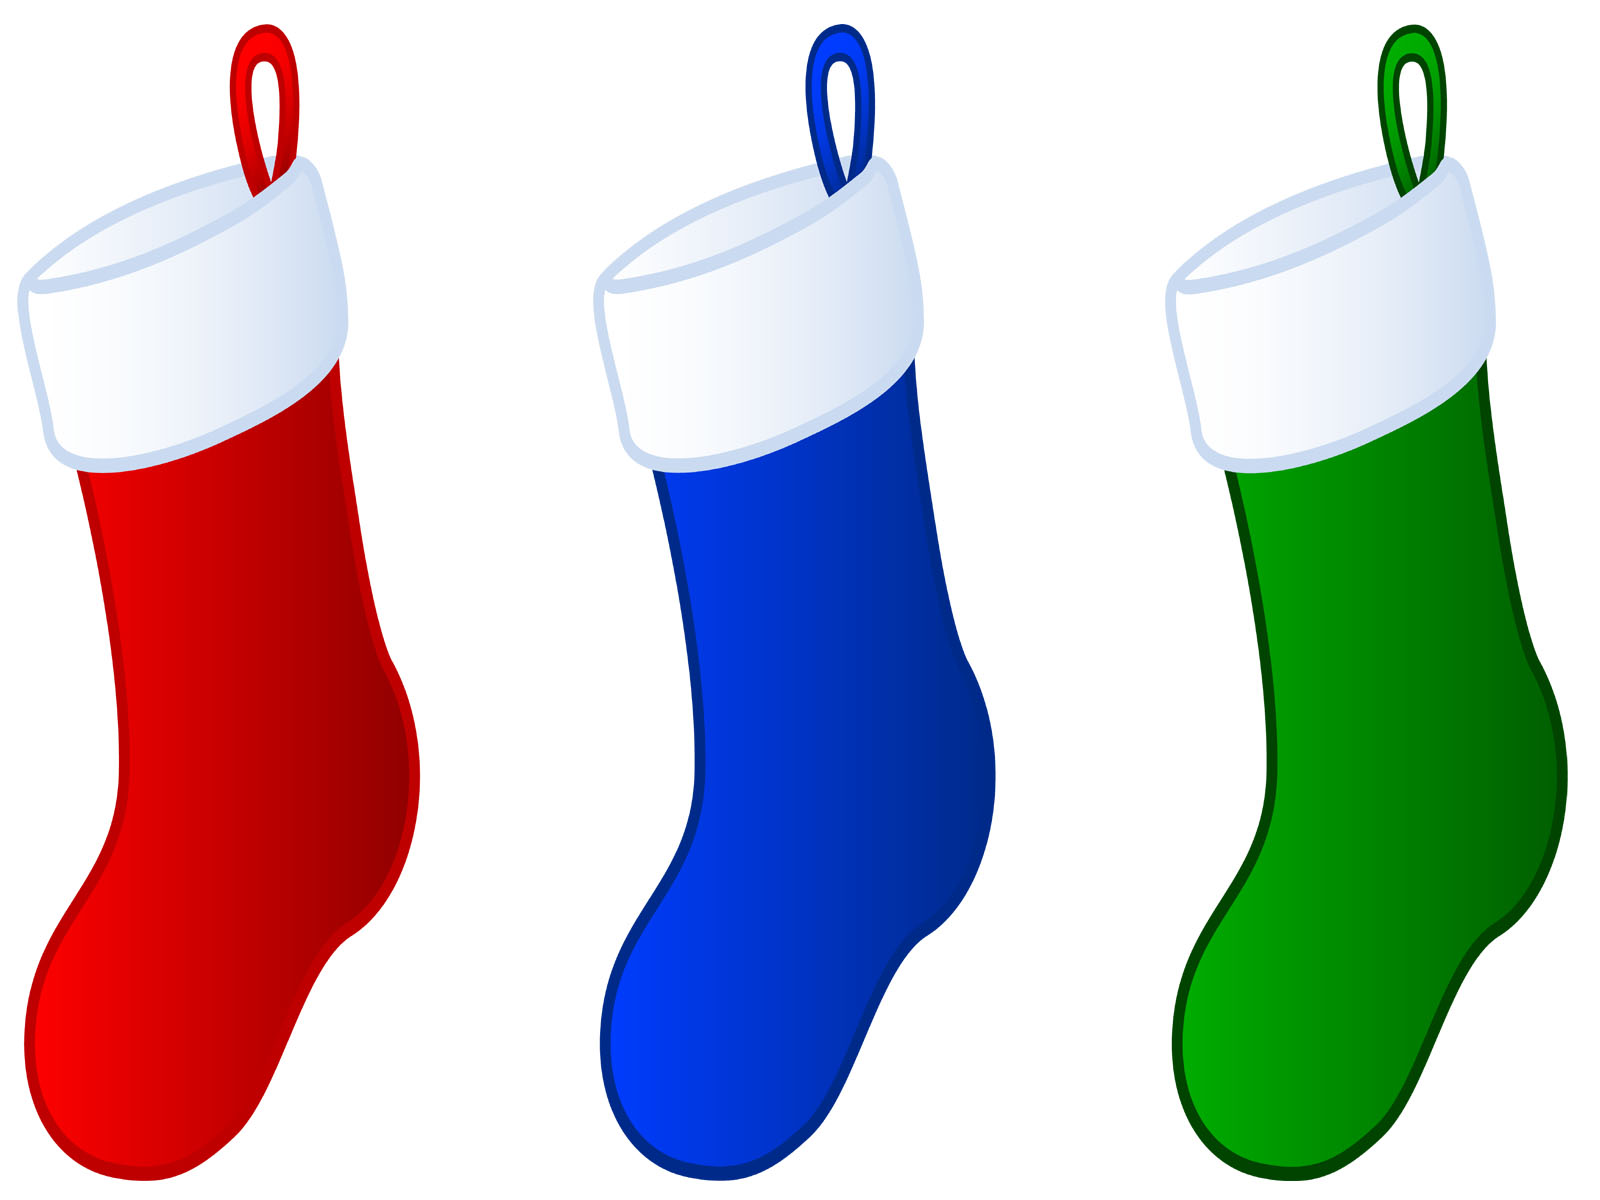 wallpapers: Christmas Stockings